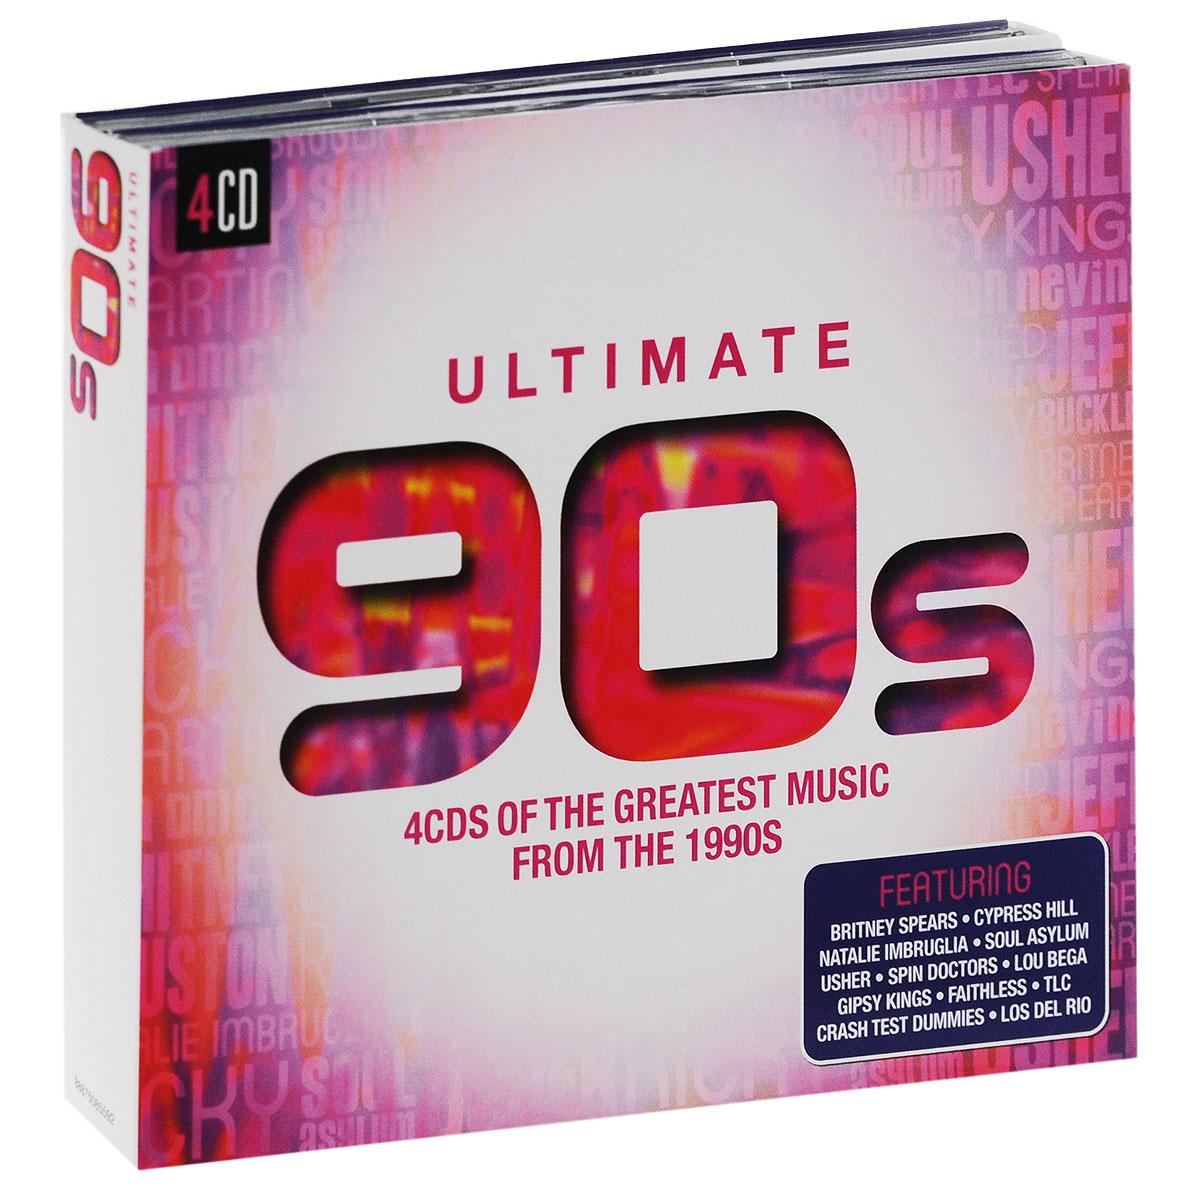 Faithless,Apollo 440,Scatman John,Rednex,B'Witched,Бетти Бу,Джеймс Лэнс,Los Del Rio,Лу Бега,Gipsy Kings Ultimate 90s (4 CD) gipsy kings gipsy kings the very best of